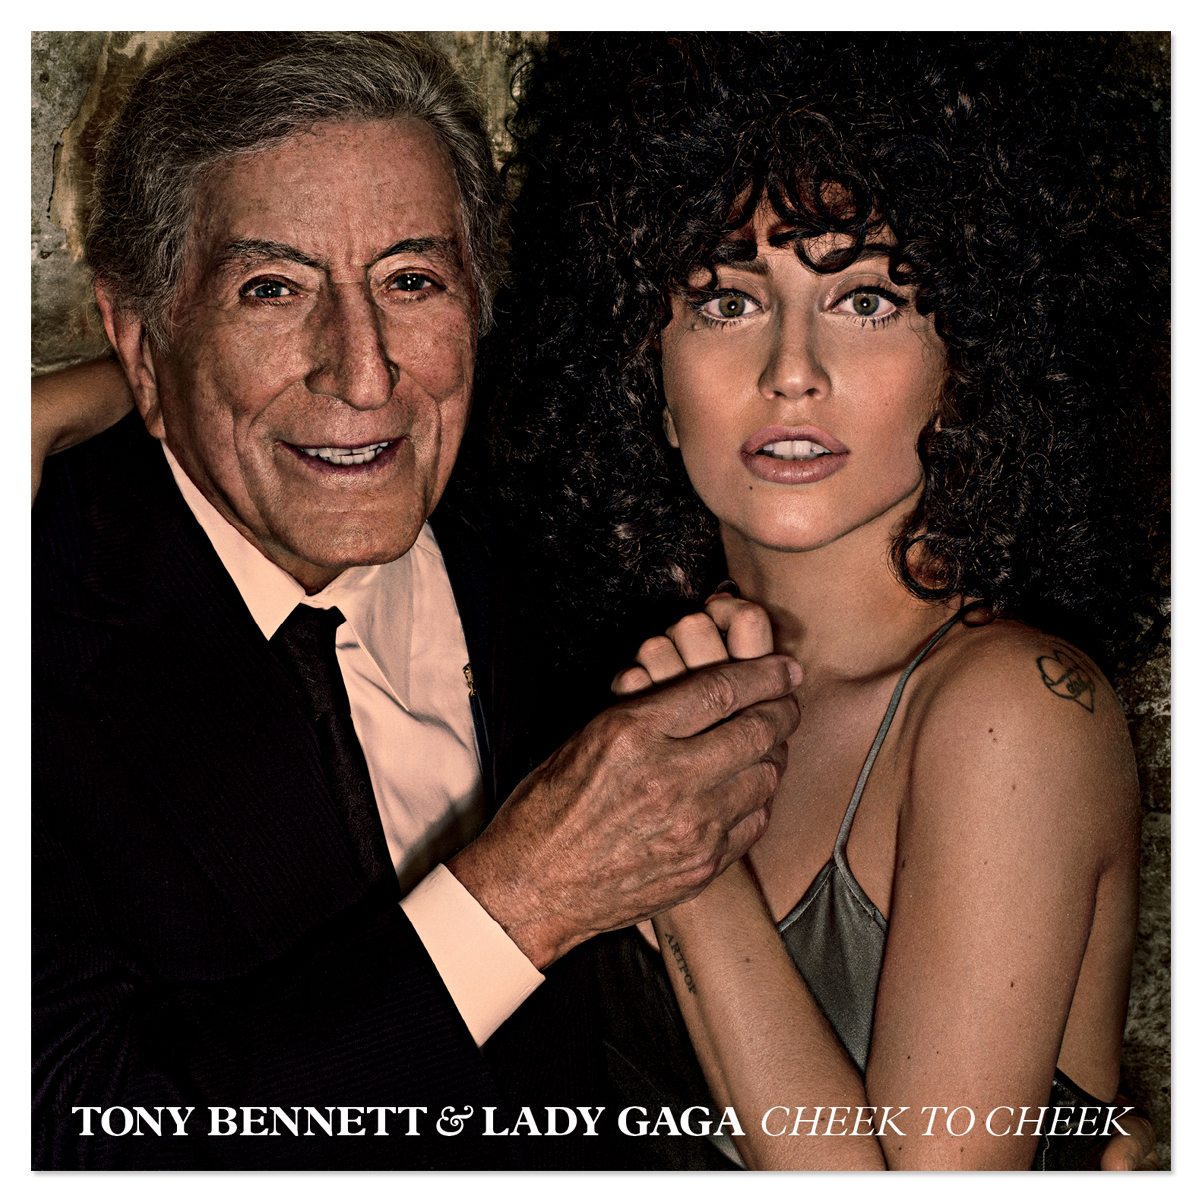 Tony Bennett/Lady Gaga - Cheek to Cheek